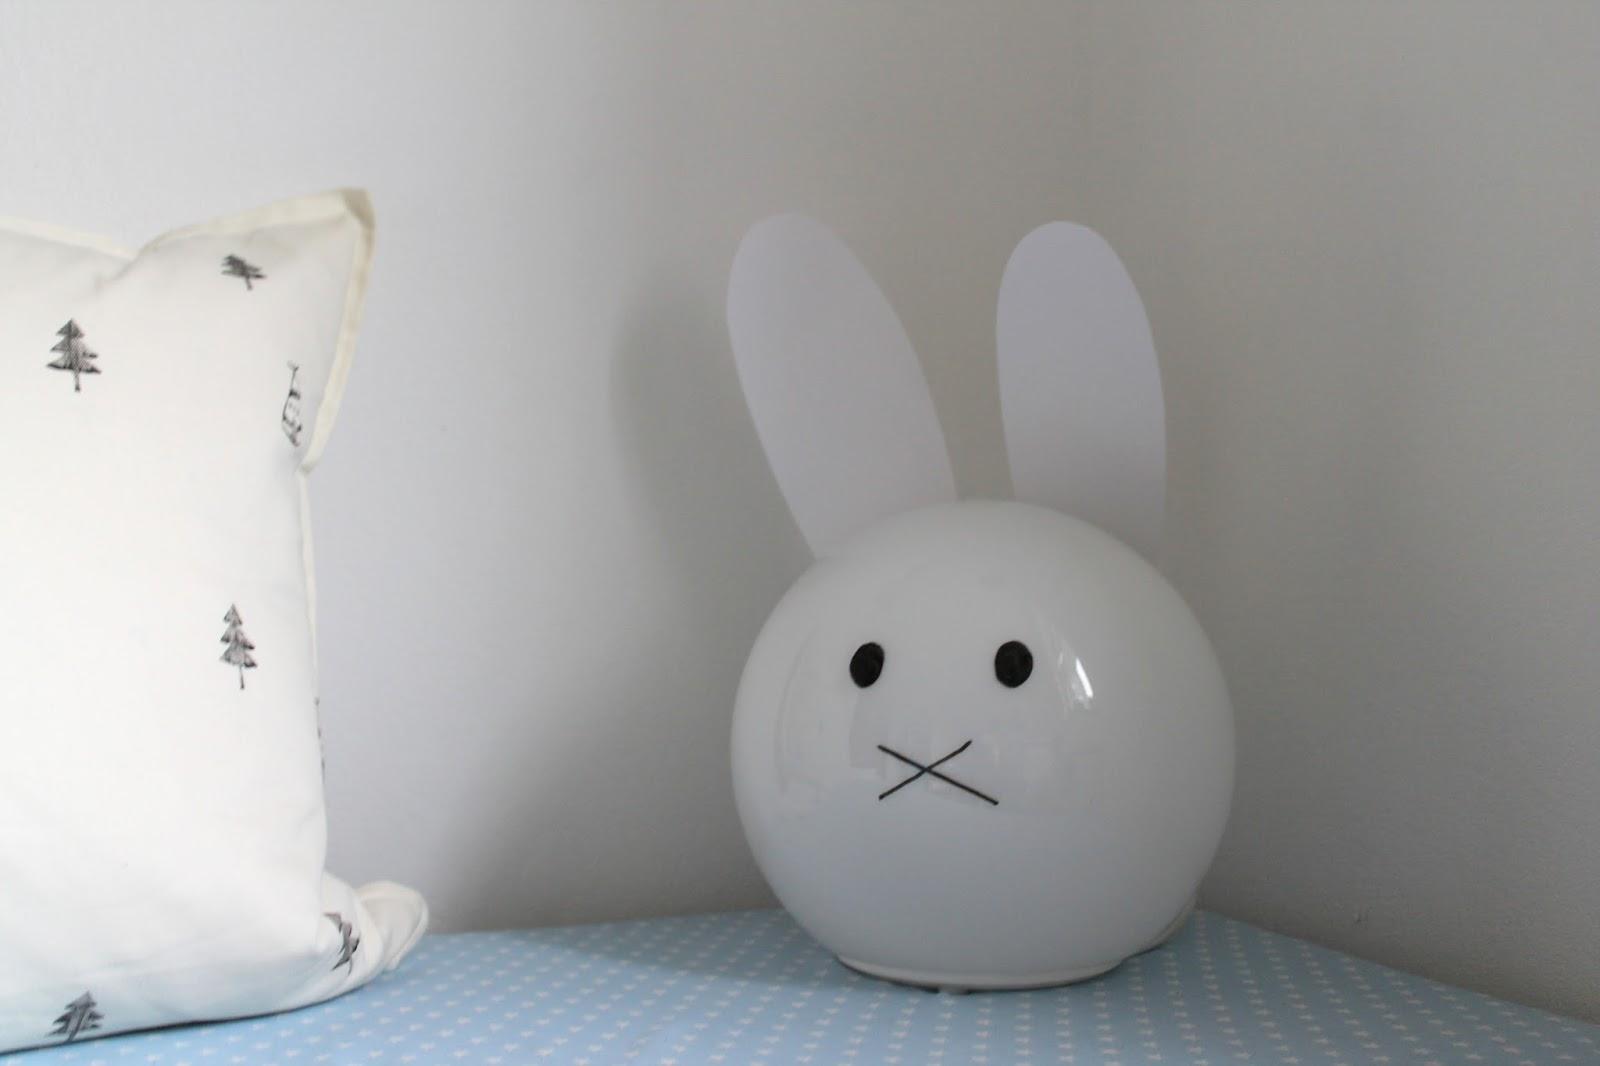 kleines freudenhaus diy ikea hack meister lampe nicht. Black Bedroom Furniture Sets. Home Design Ideas